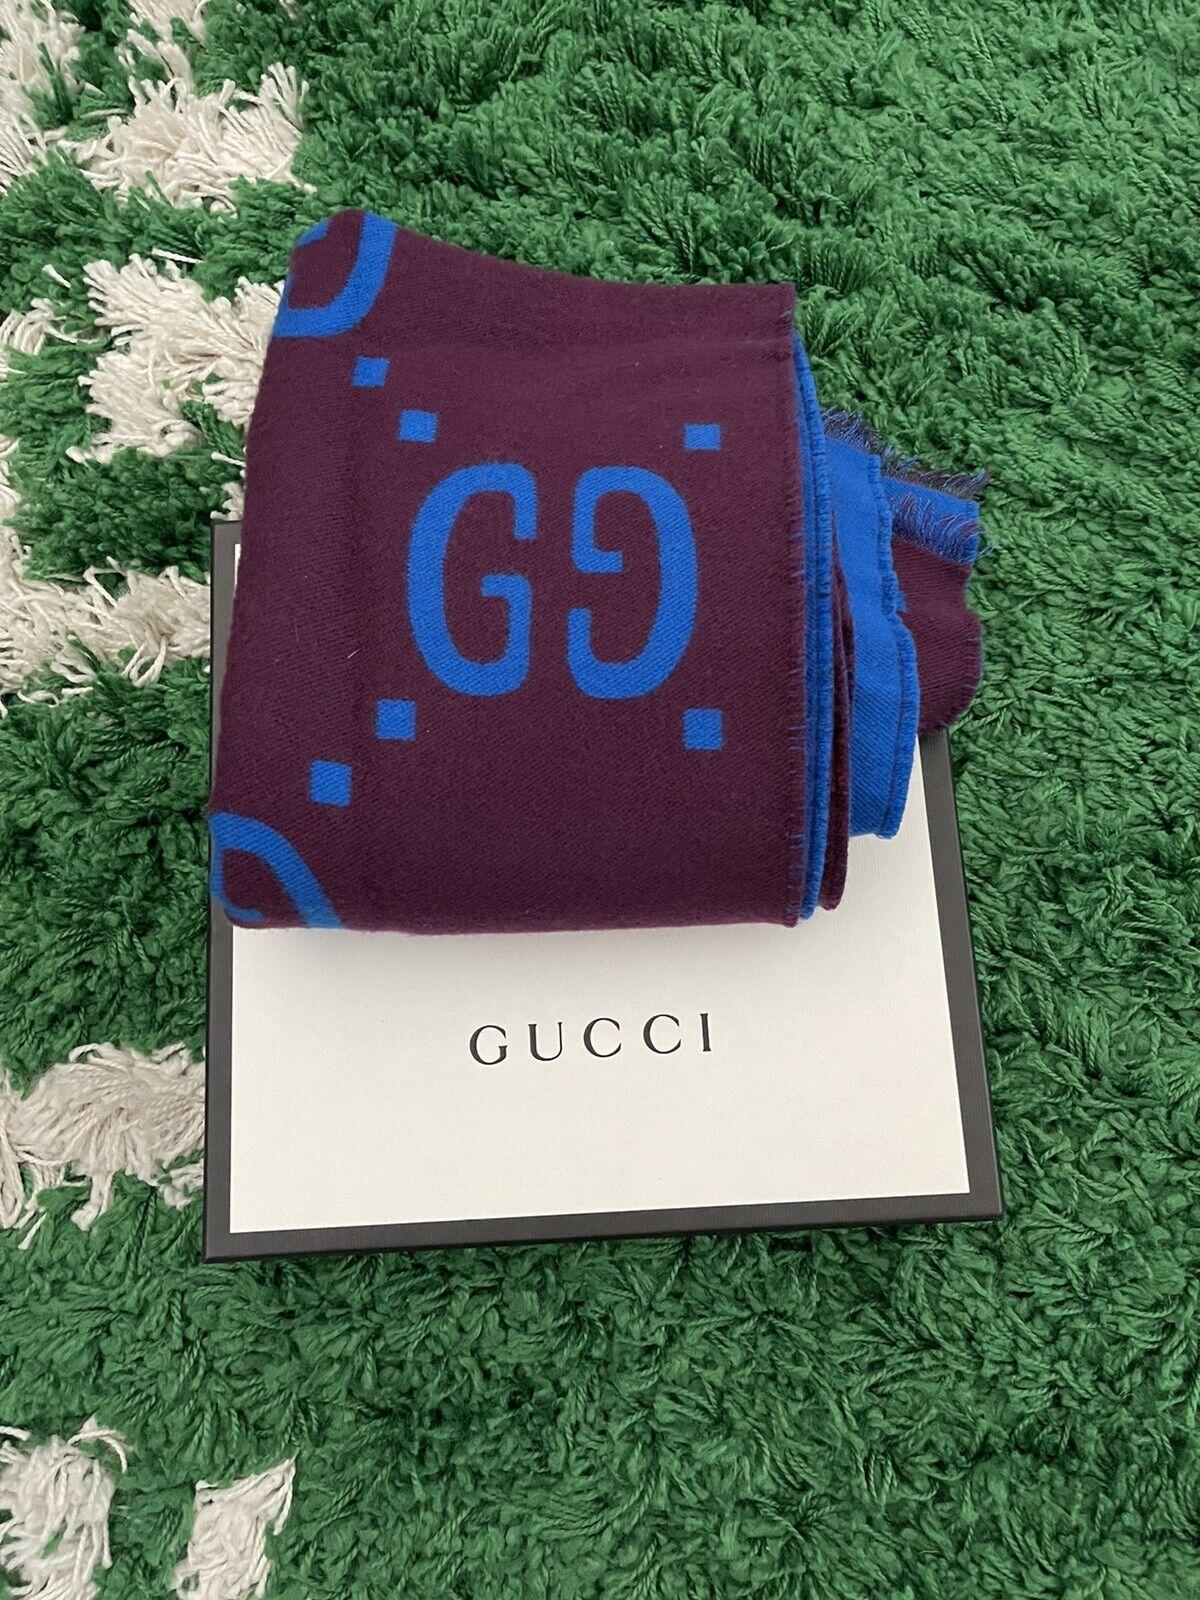 Gucci GG jacquard wool silk scarf - image 8